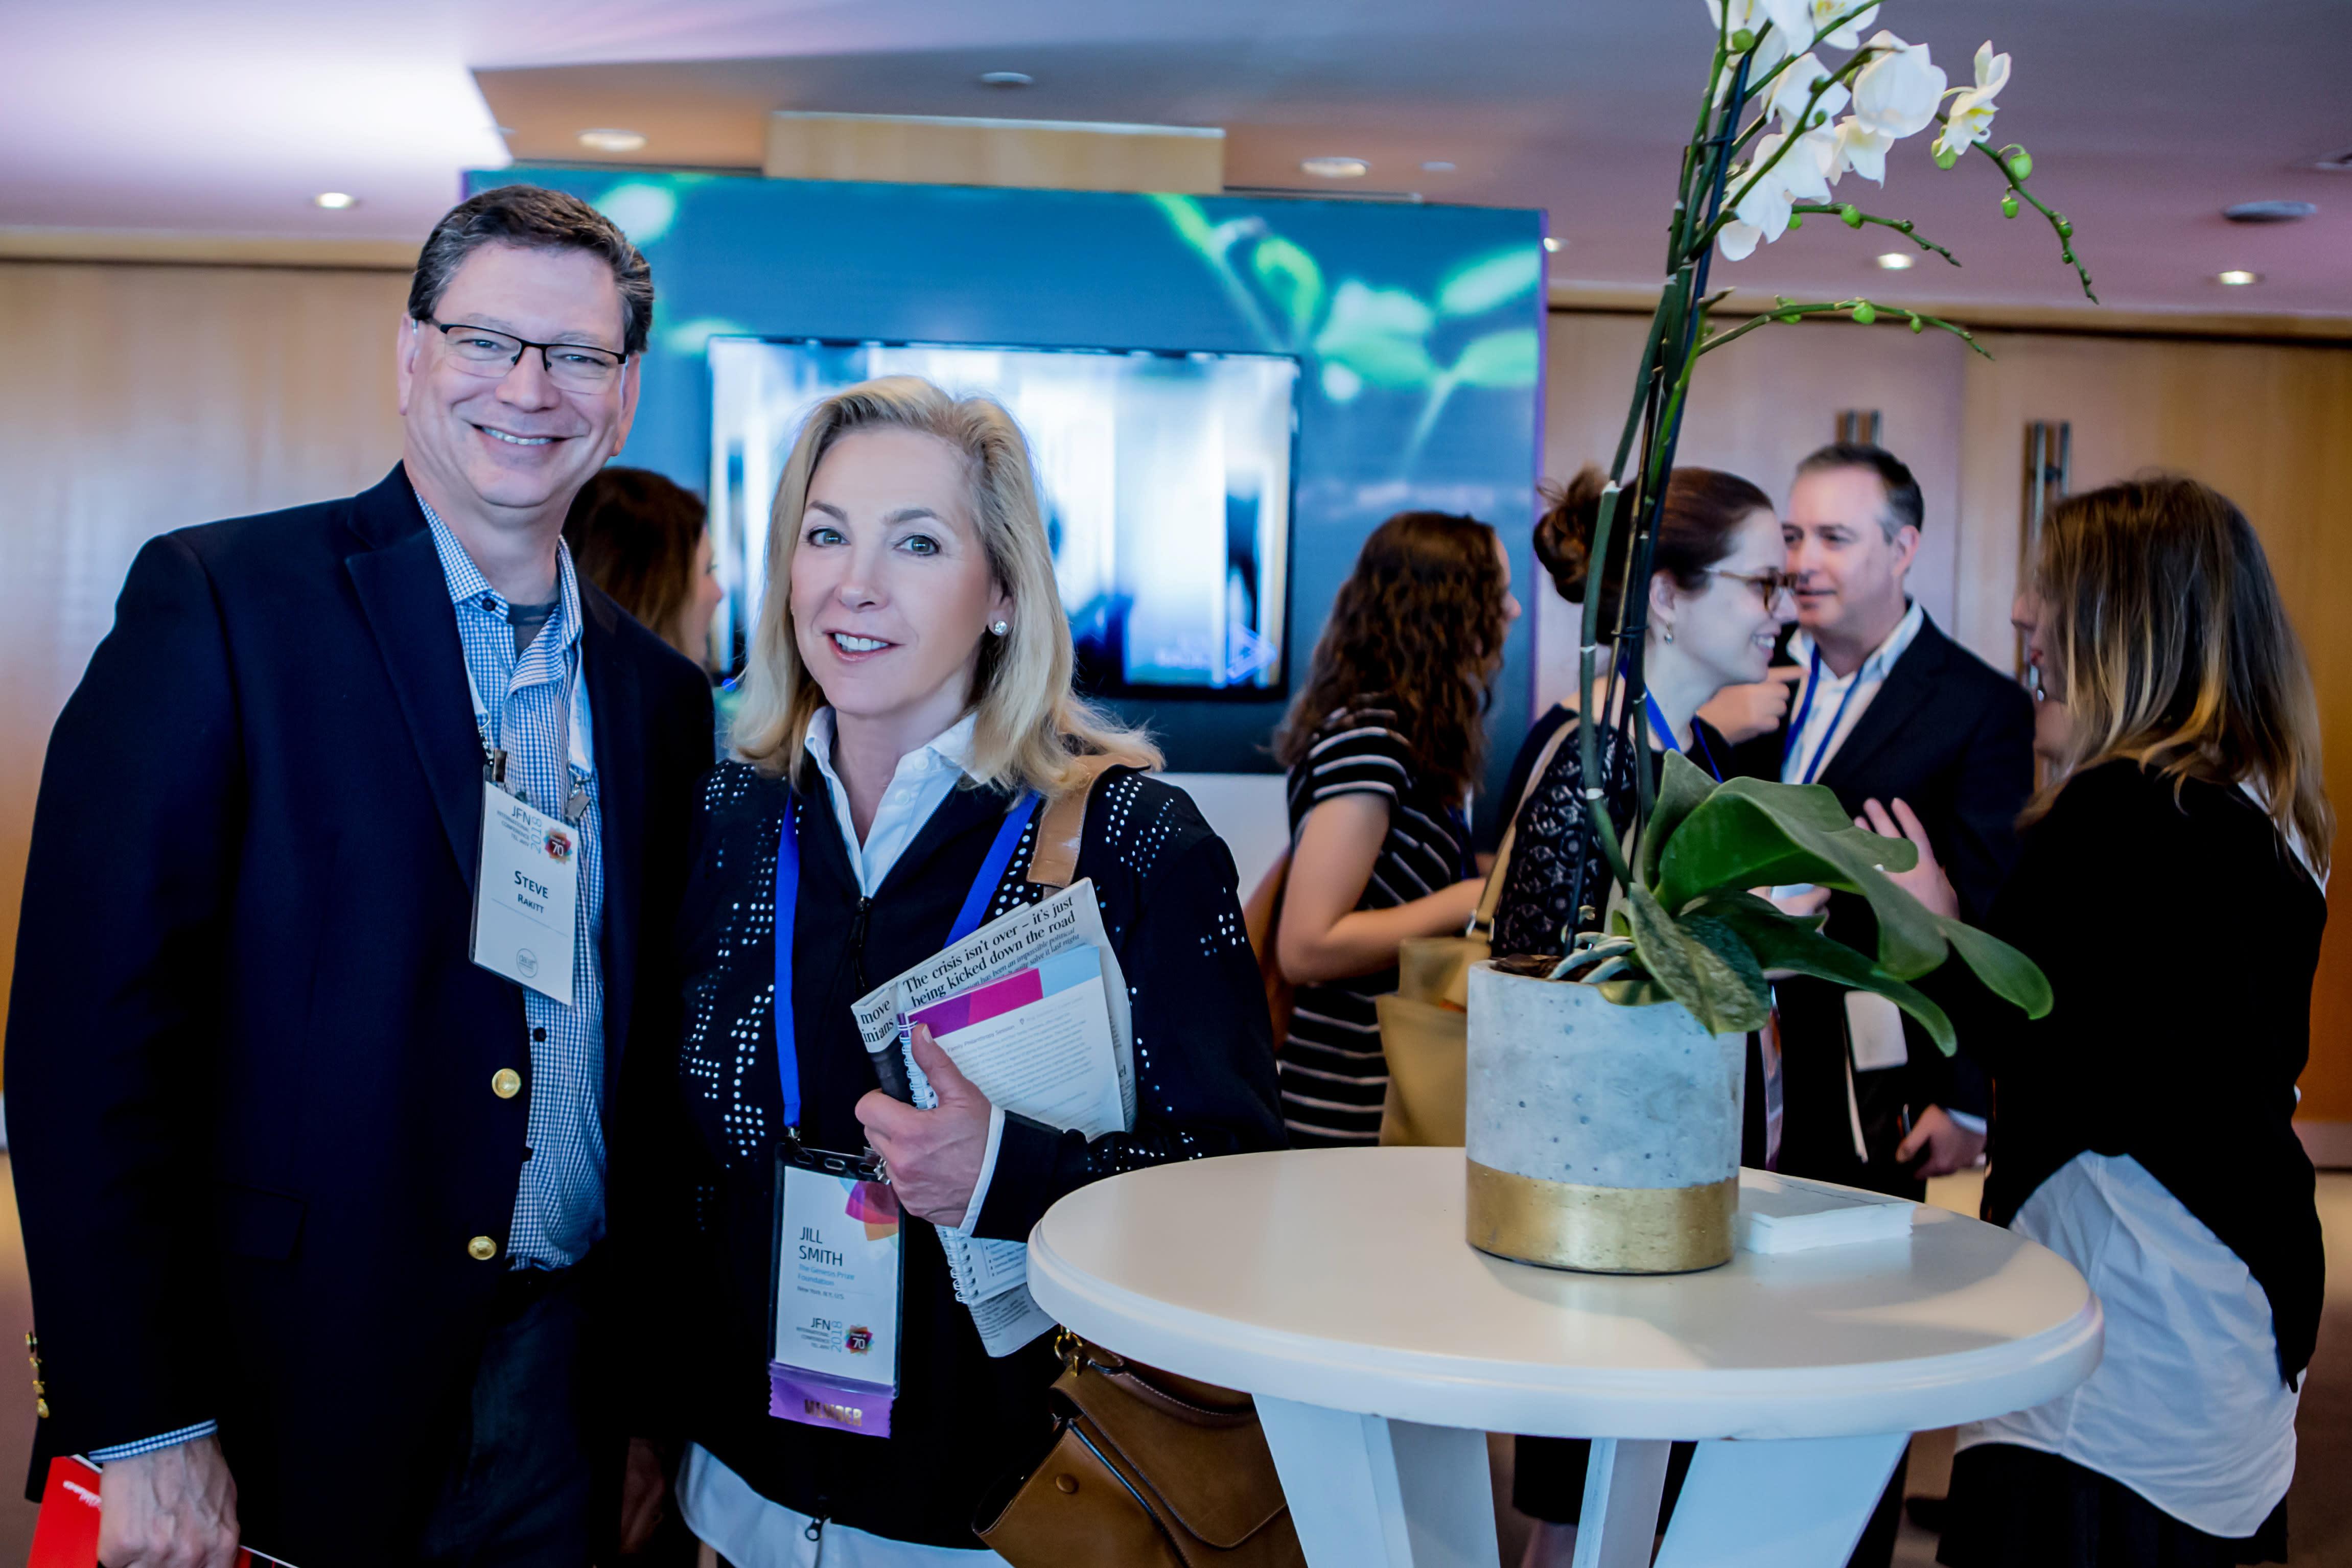 Steve Rakitt, president, Genesis Prize Foundation and Jill Smith, senior adviser to the chairman, Genesis Prize Foundation